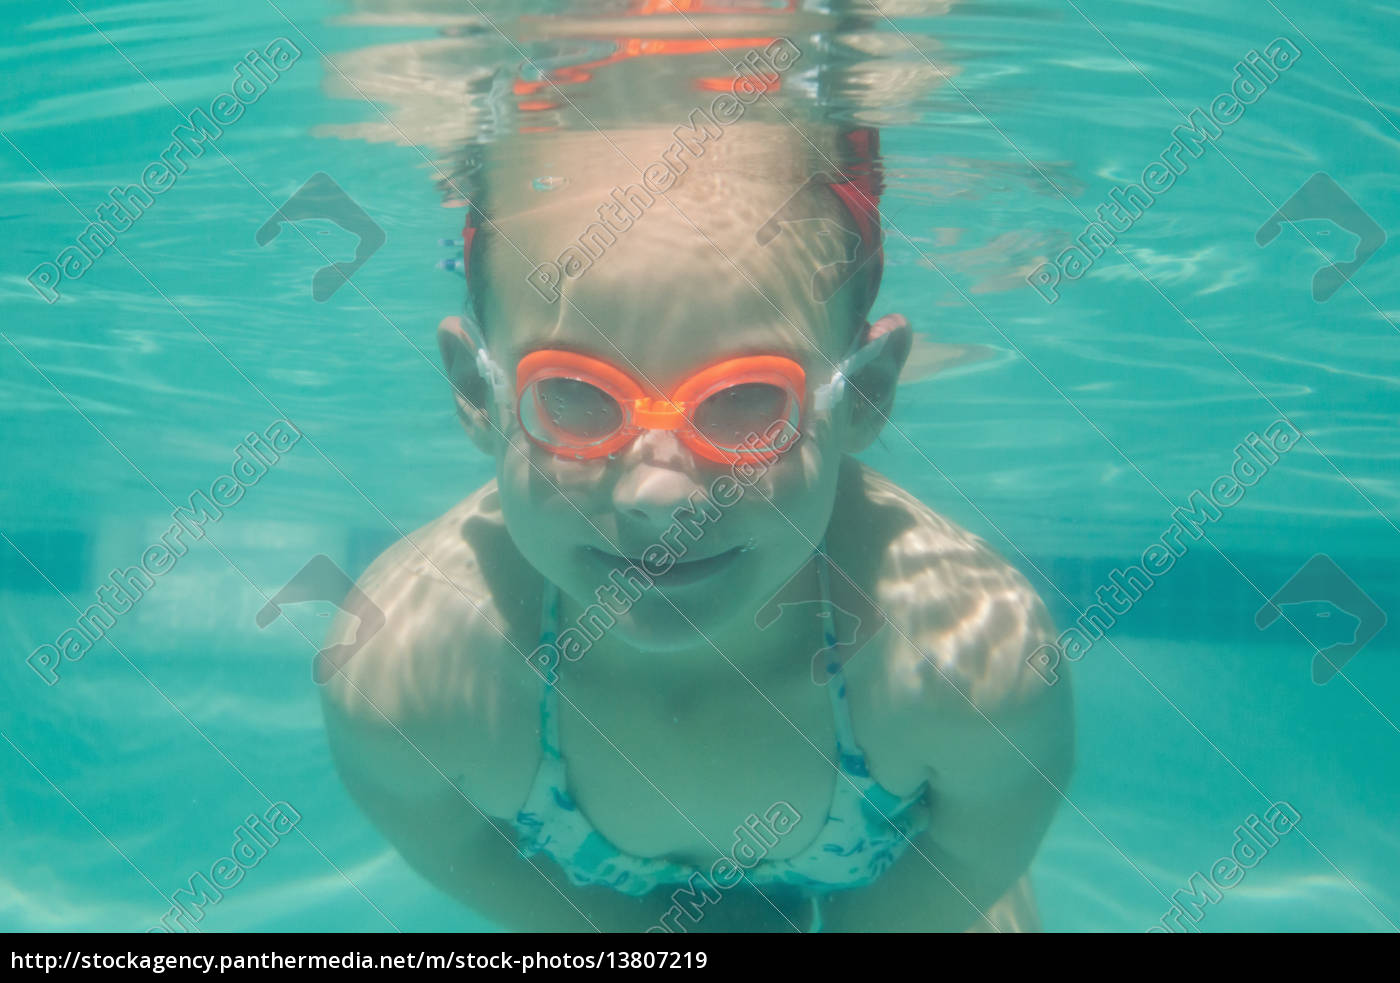 cute, kind, unter, wasser, im, pool - 13807219